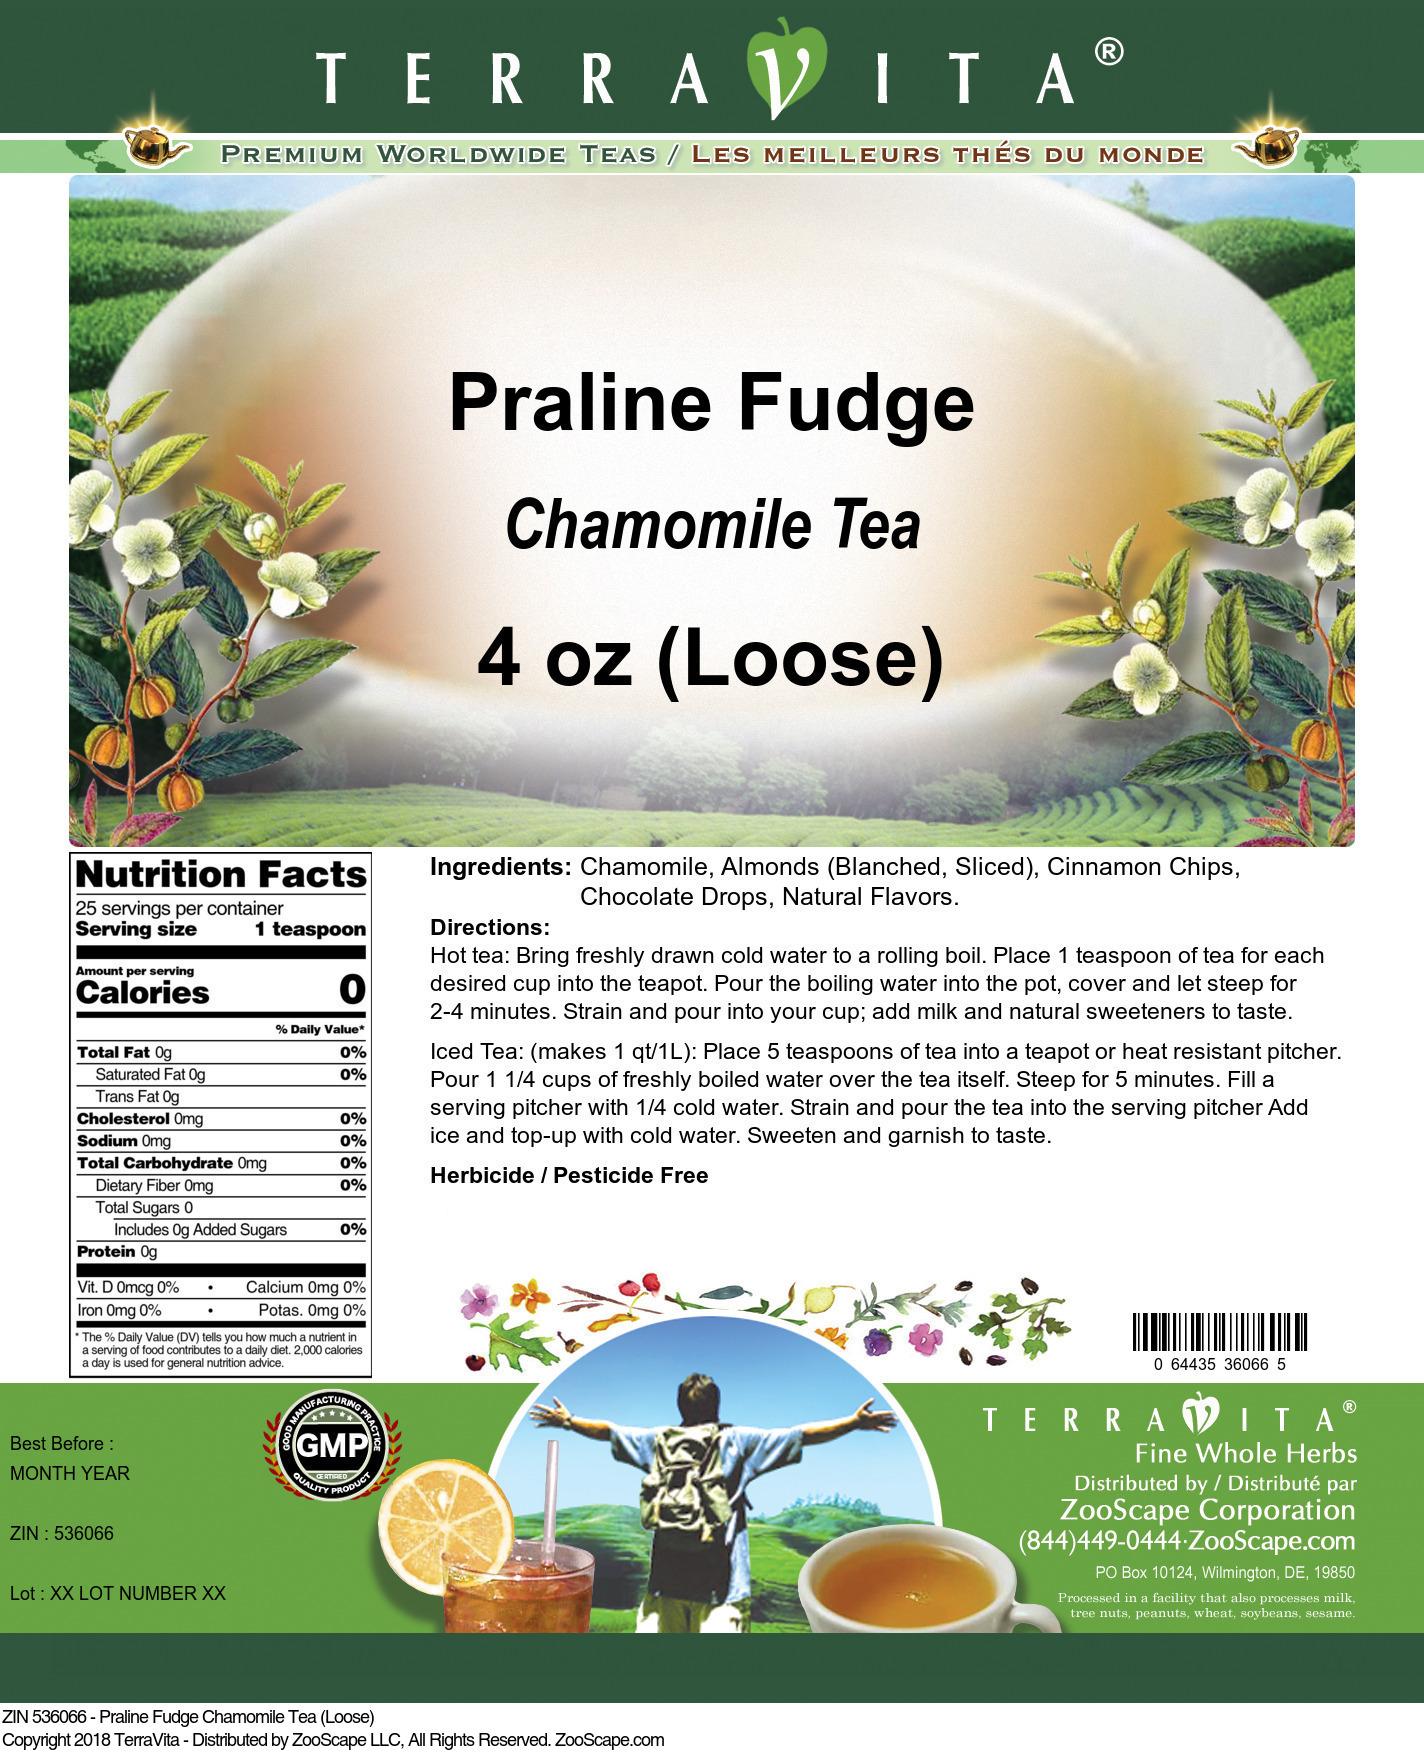 Praline Fudge Chamomile Tea (Loose)